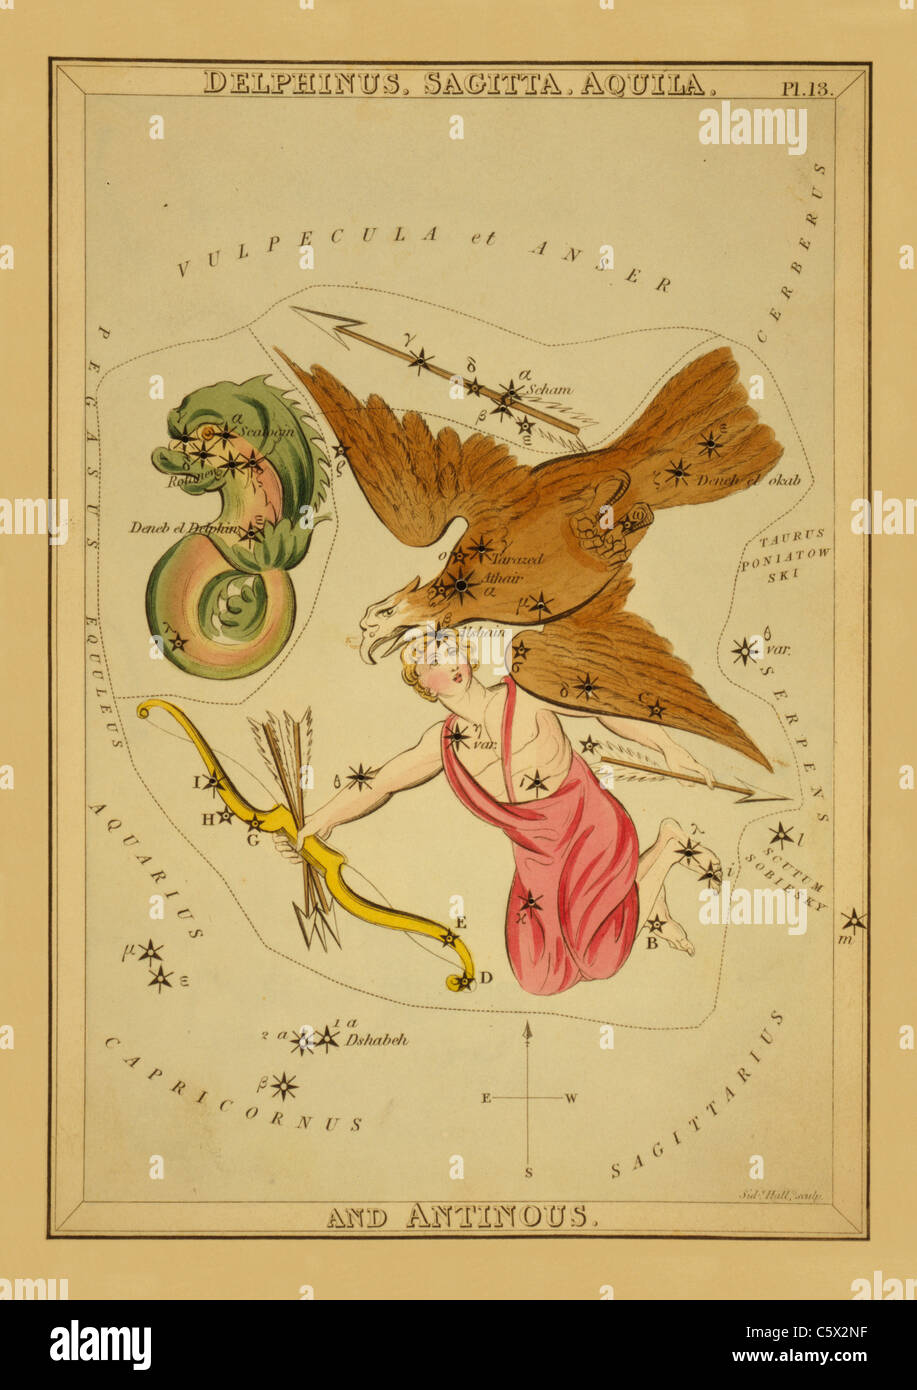 Delphinus, Sagitta, Aquila, and Antinous - 1825 Astronomical Chart - Stock Image